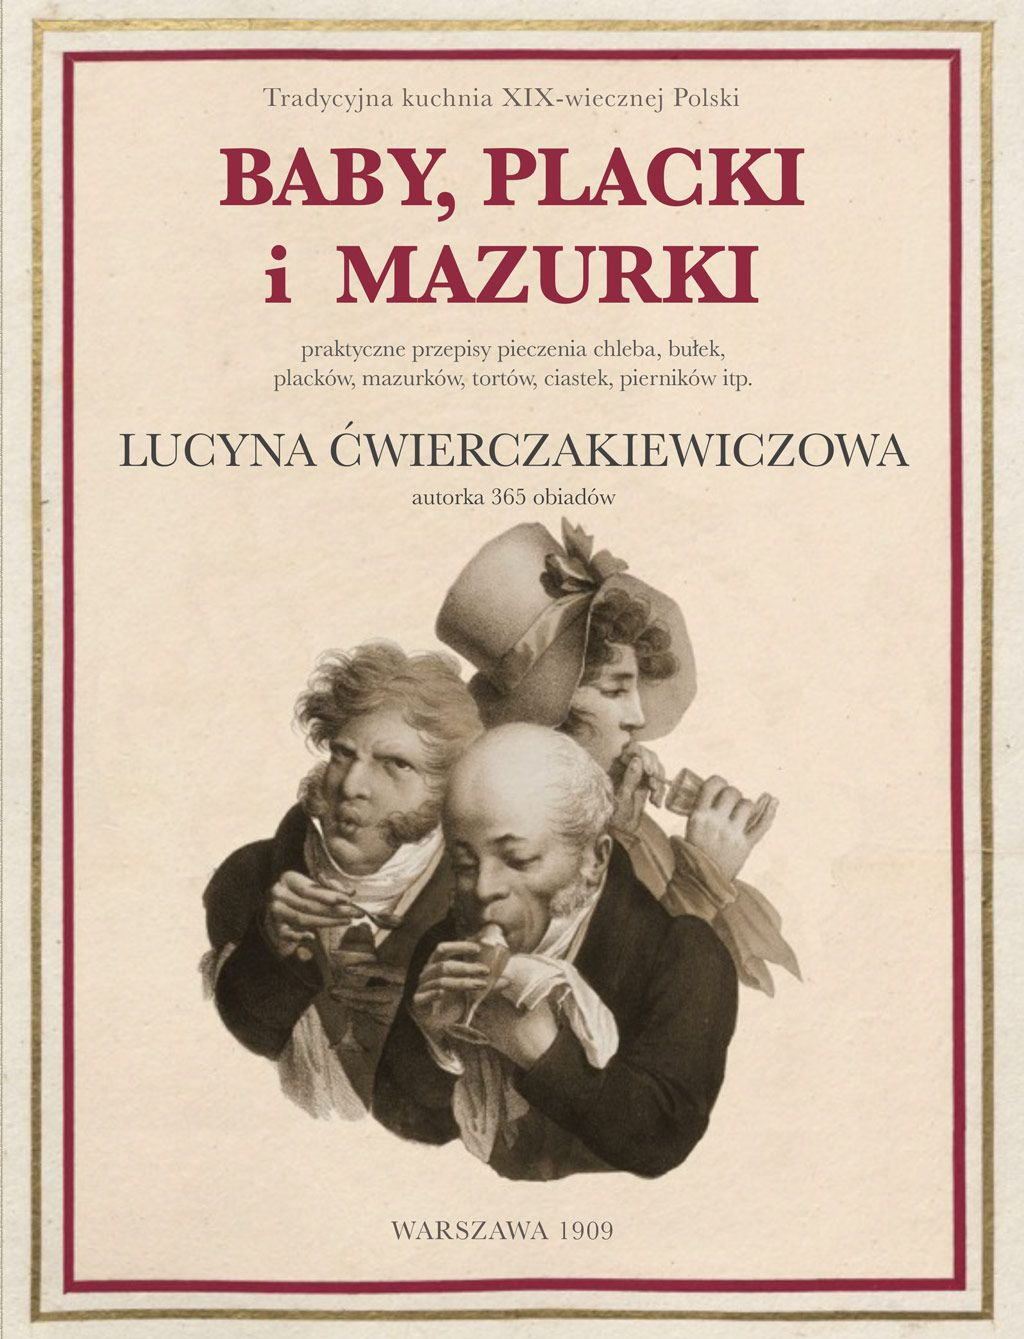 Baby,-placki-i-mazurki-kopia-1